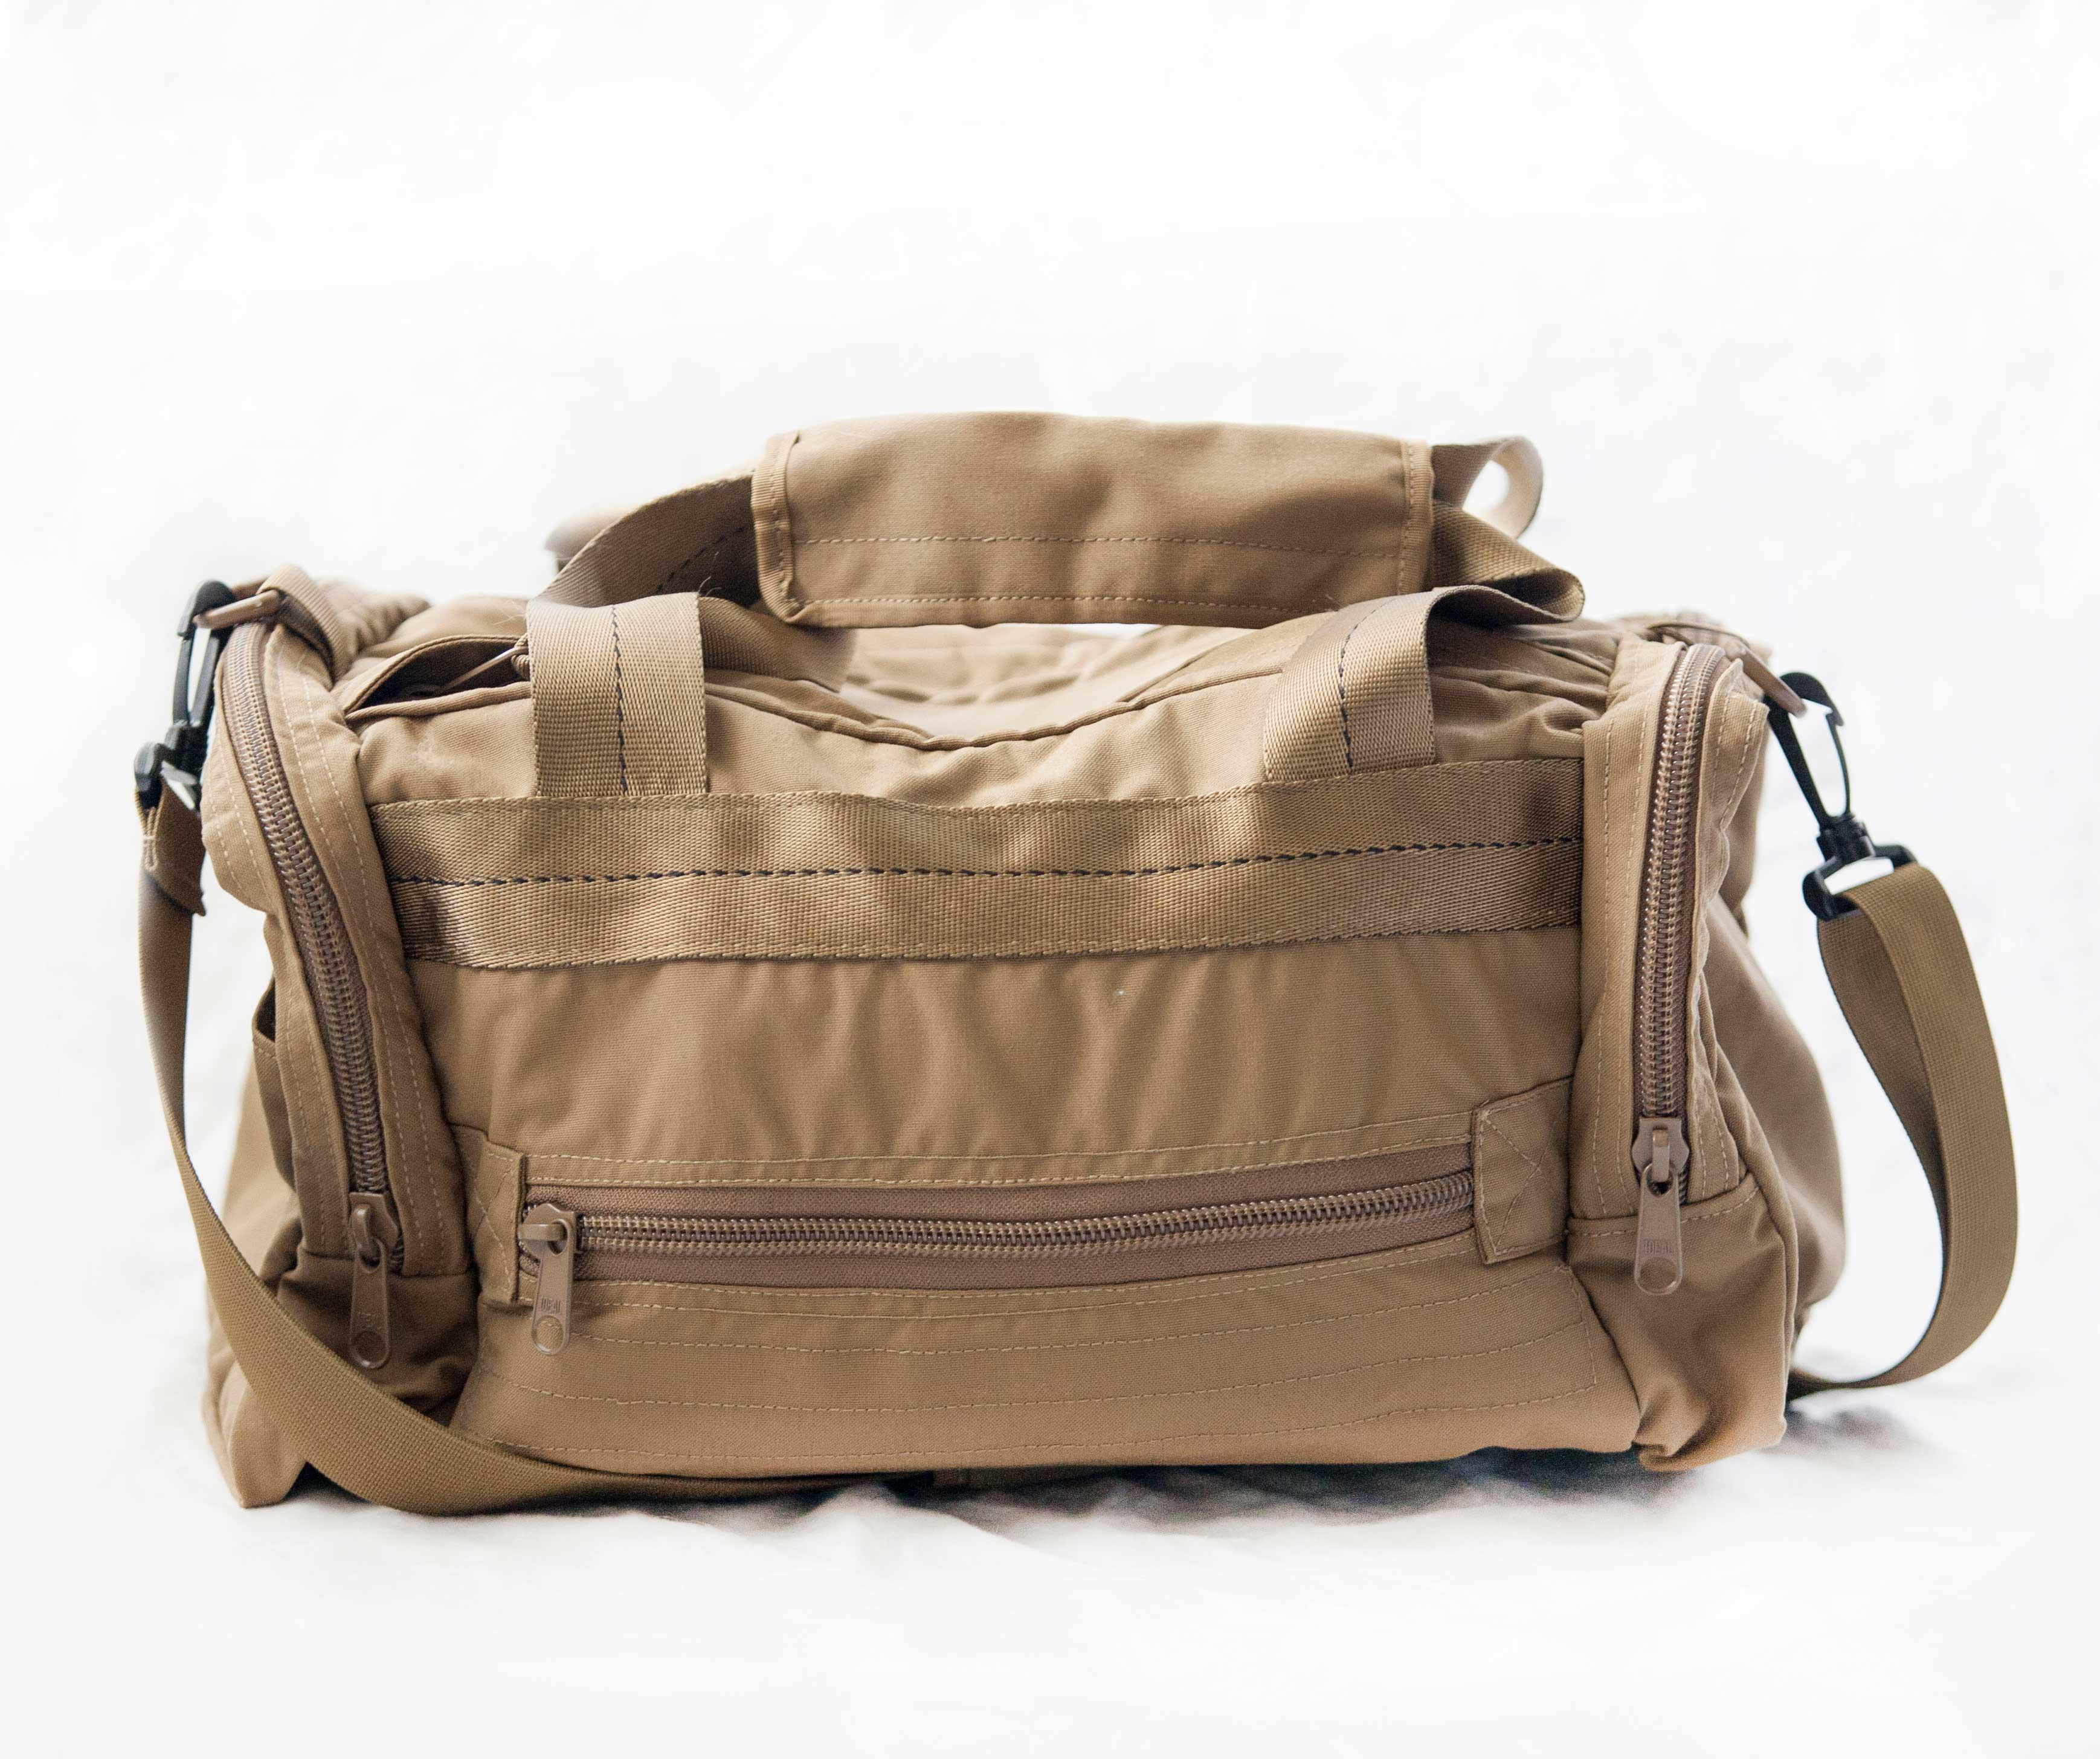 Tan US Made Gun Bag